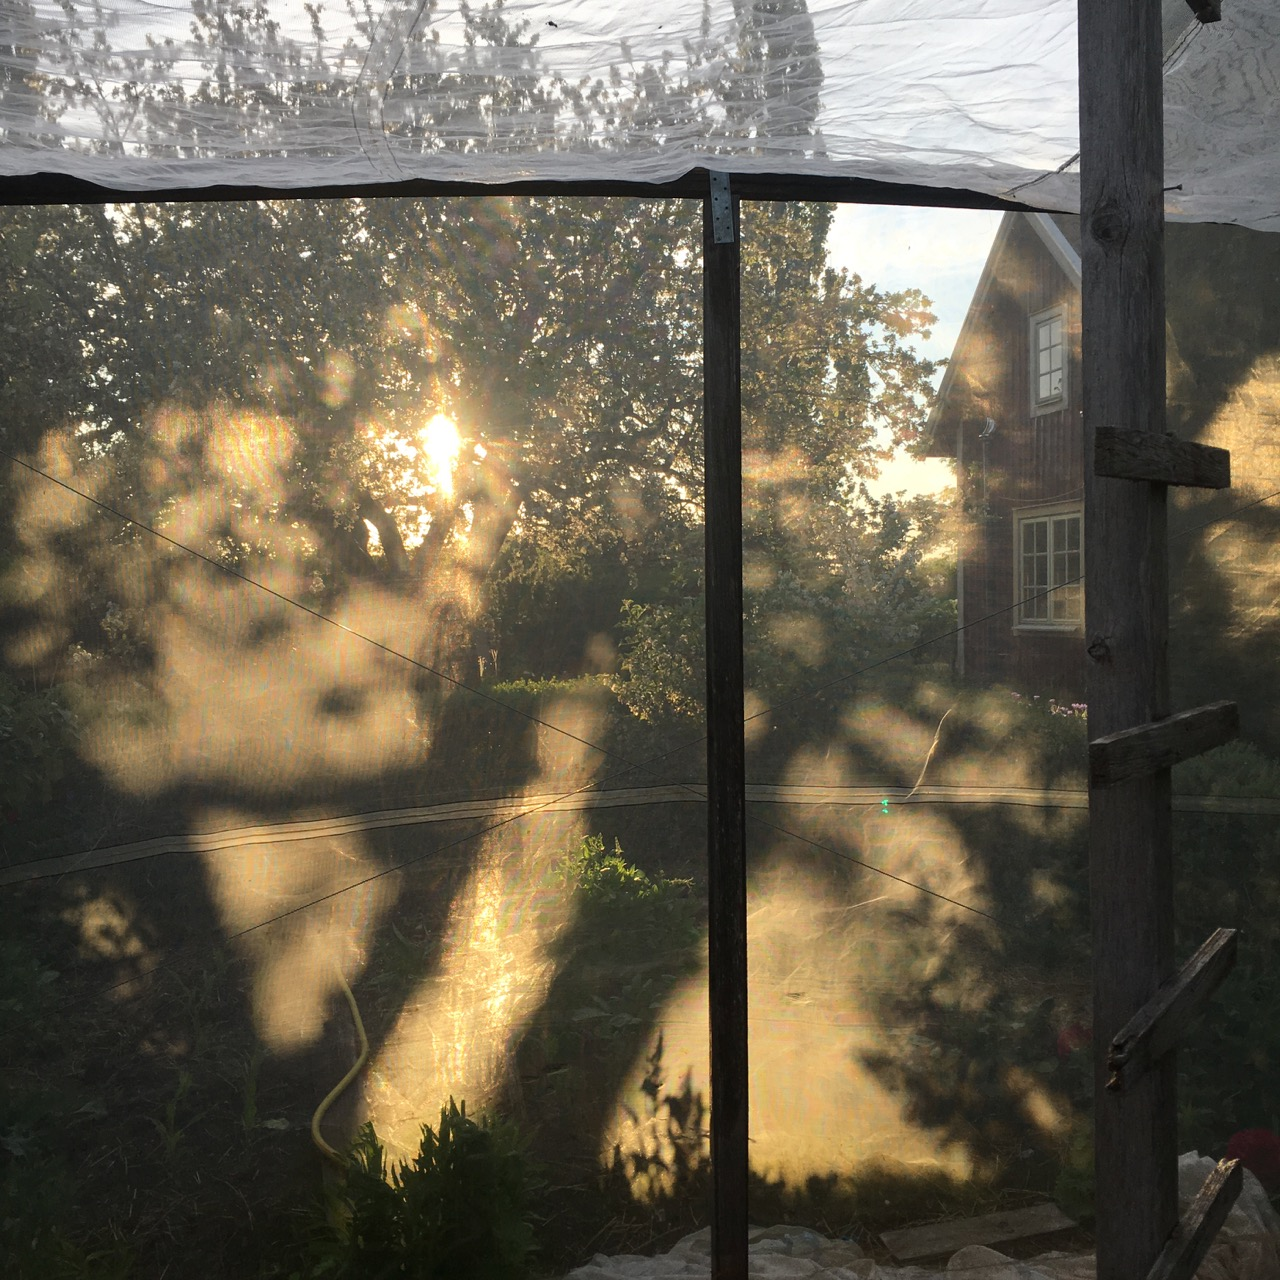 sol på kålhuset